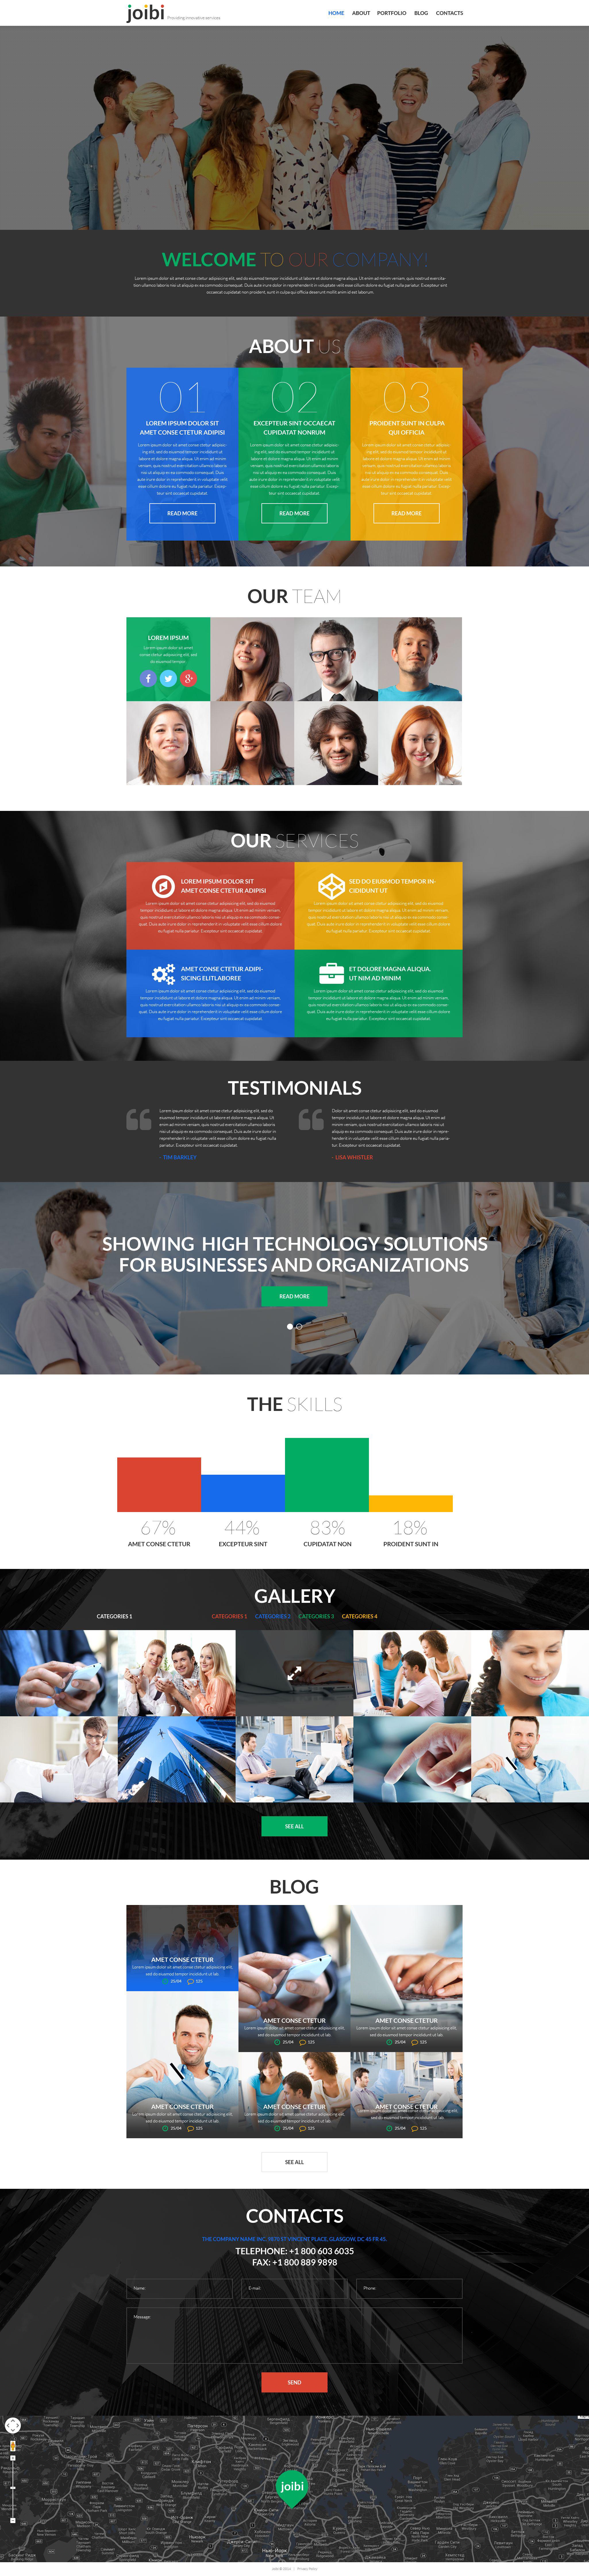 Business Services Promotion Tema WordPress №52442 - screenshot